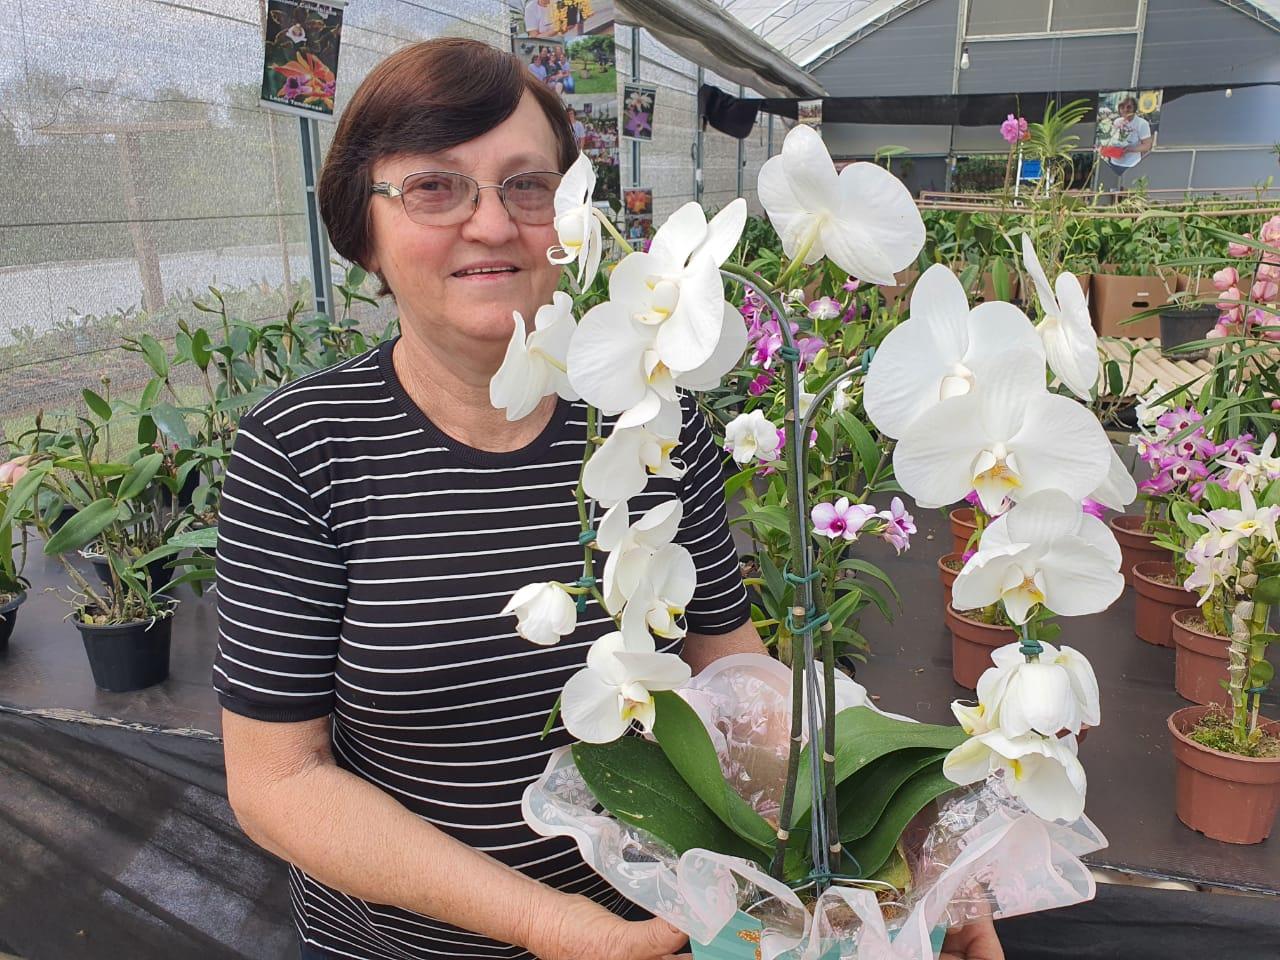 Pacote com 5 cattleyas, 5 Orquídeas diversas, 5 Phalaenopsis + 1 Cattleya de brinde